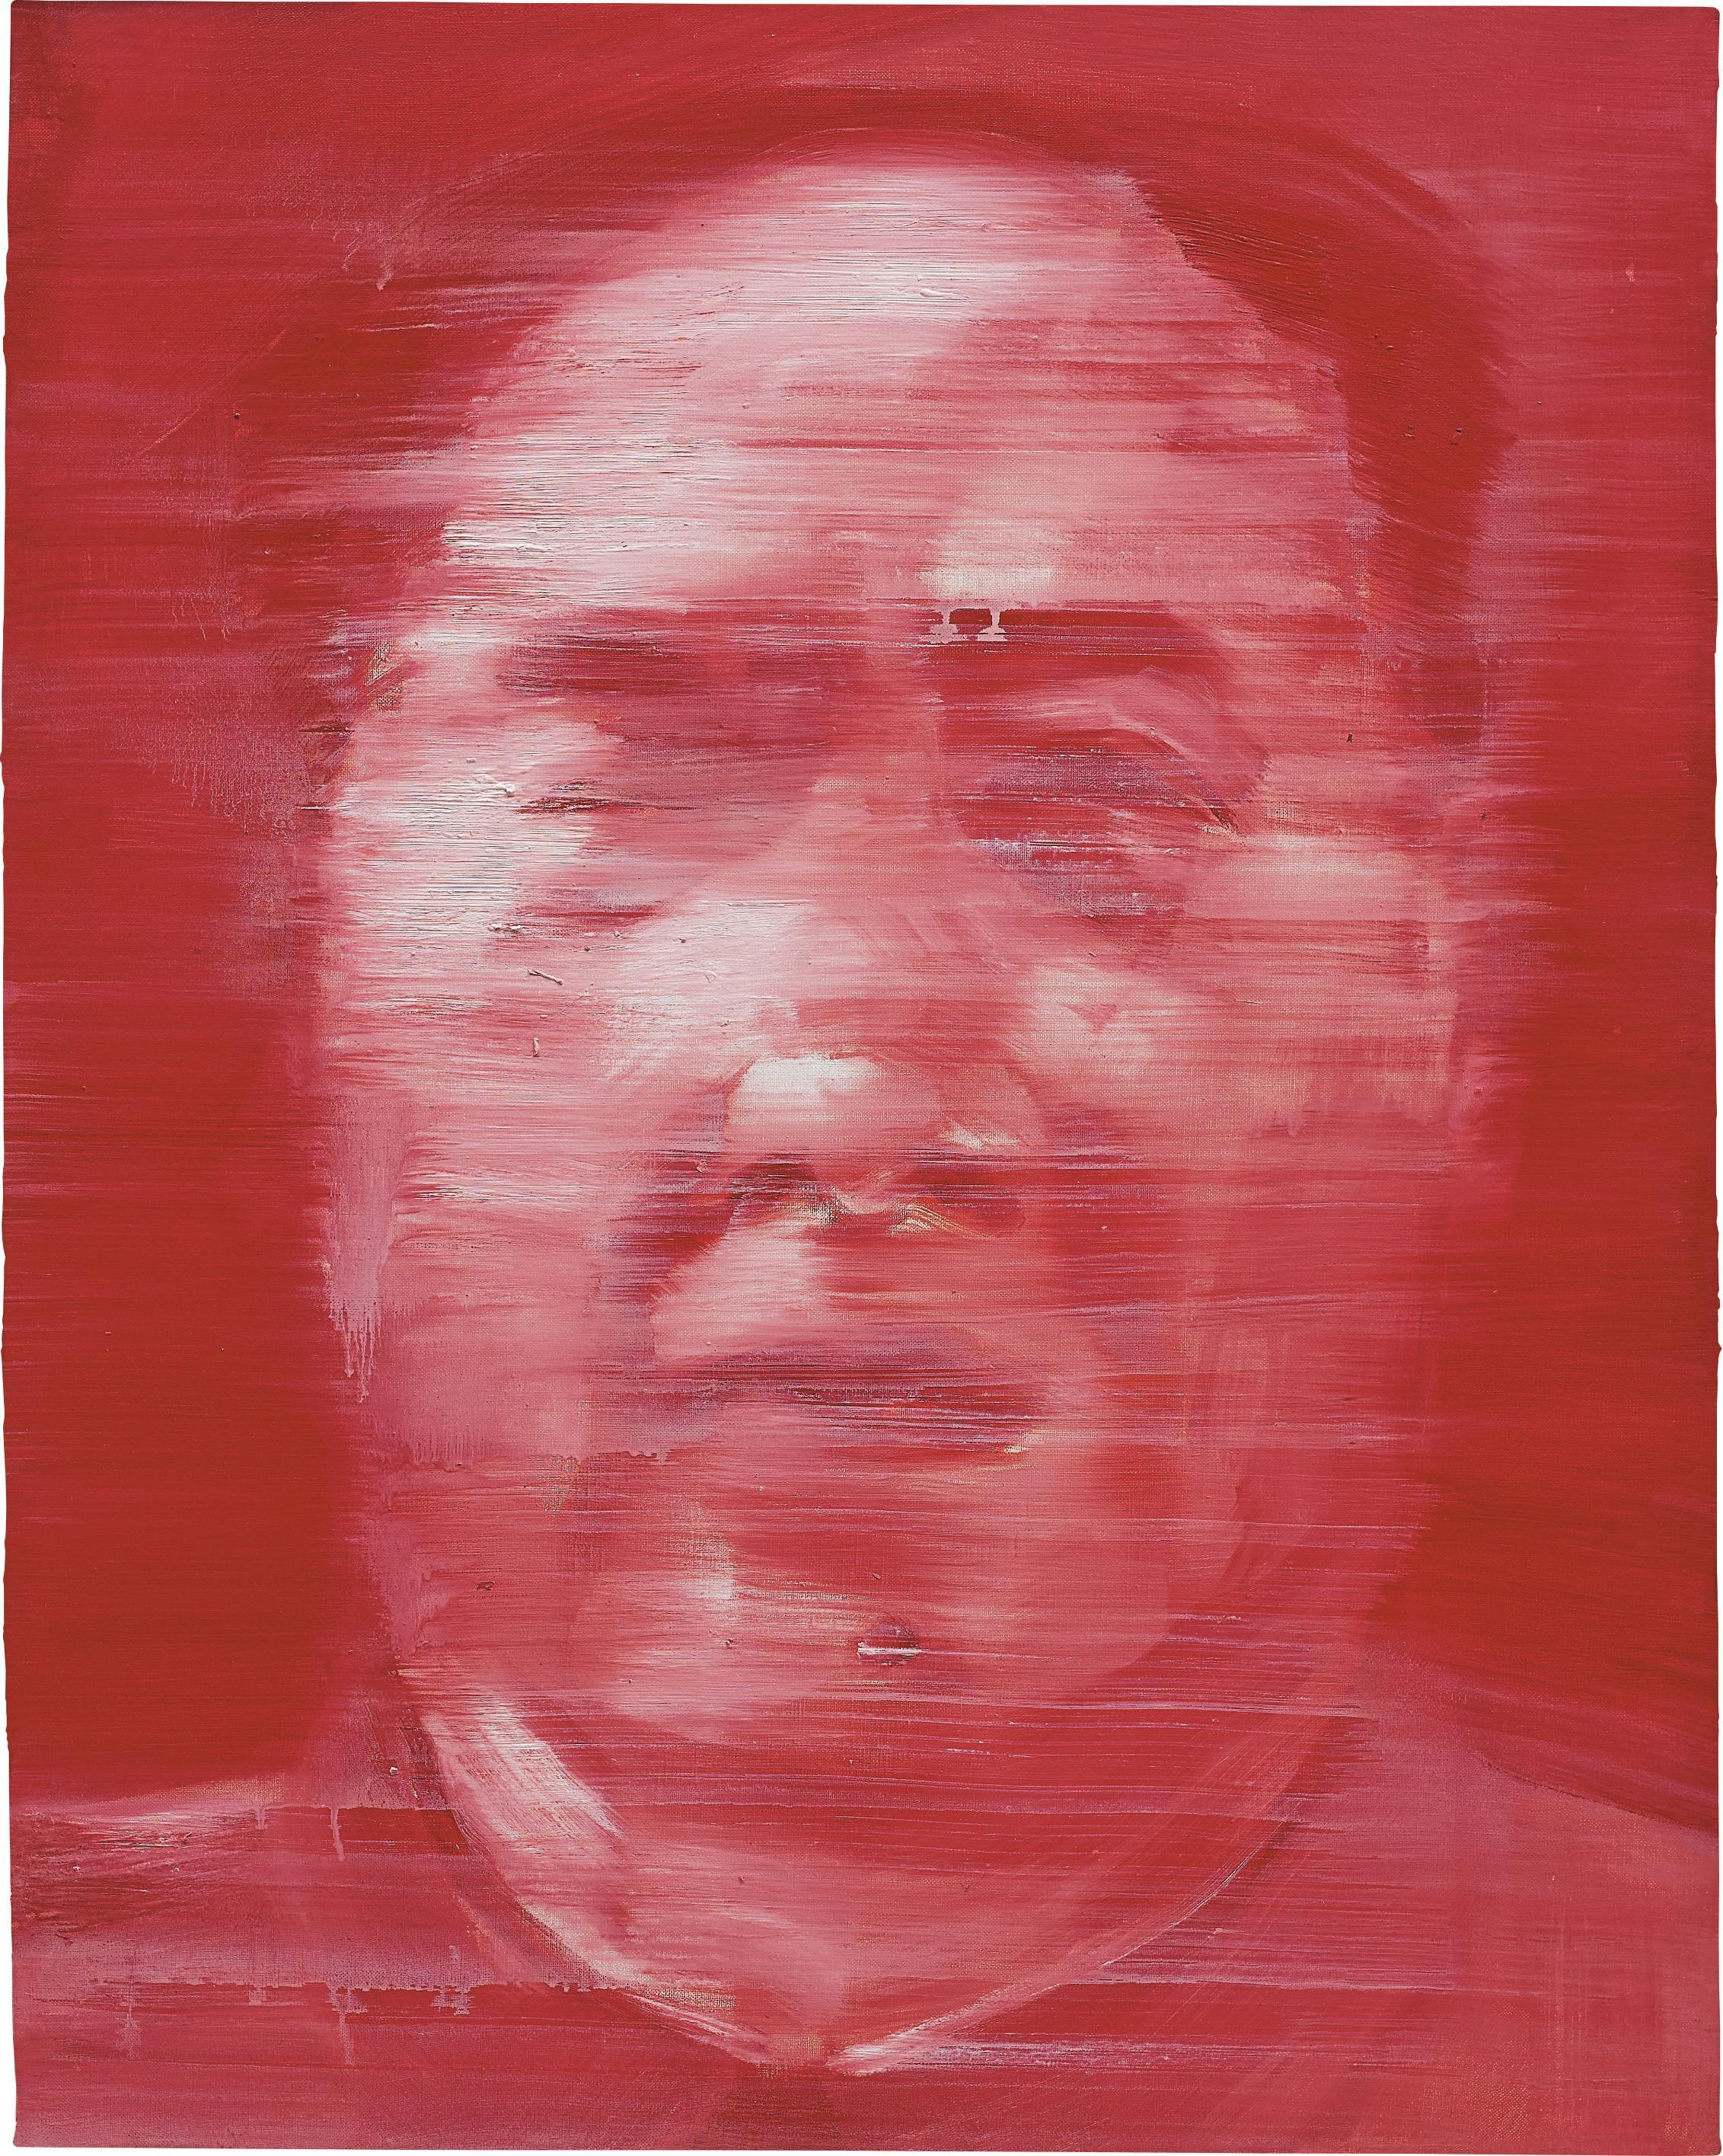 Yan Pei-Ming-Soleil Rouge III (Mao)-1993